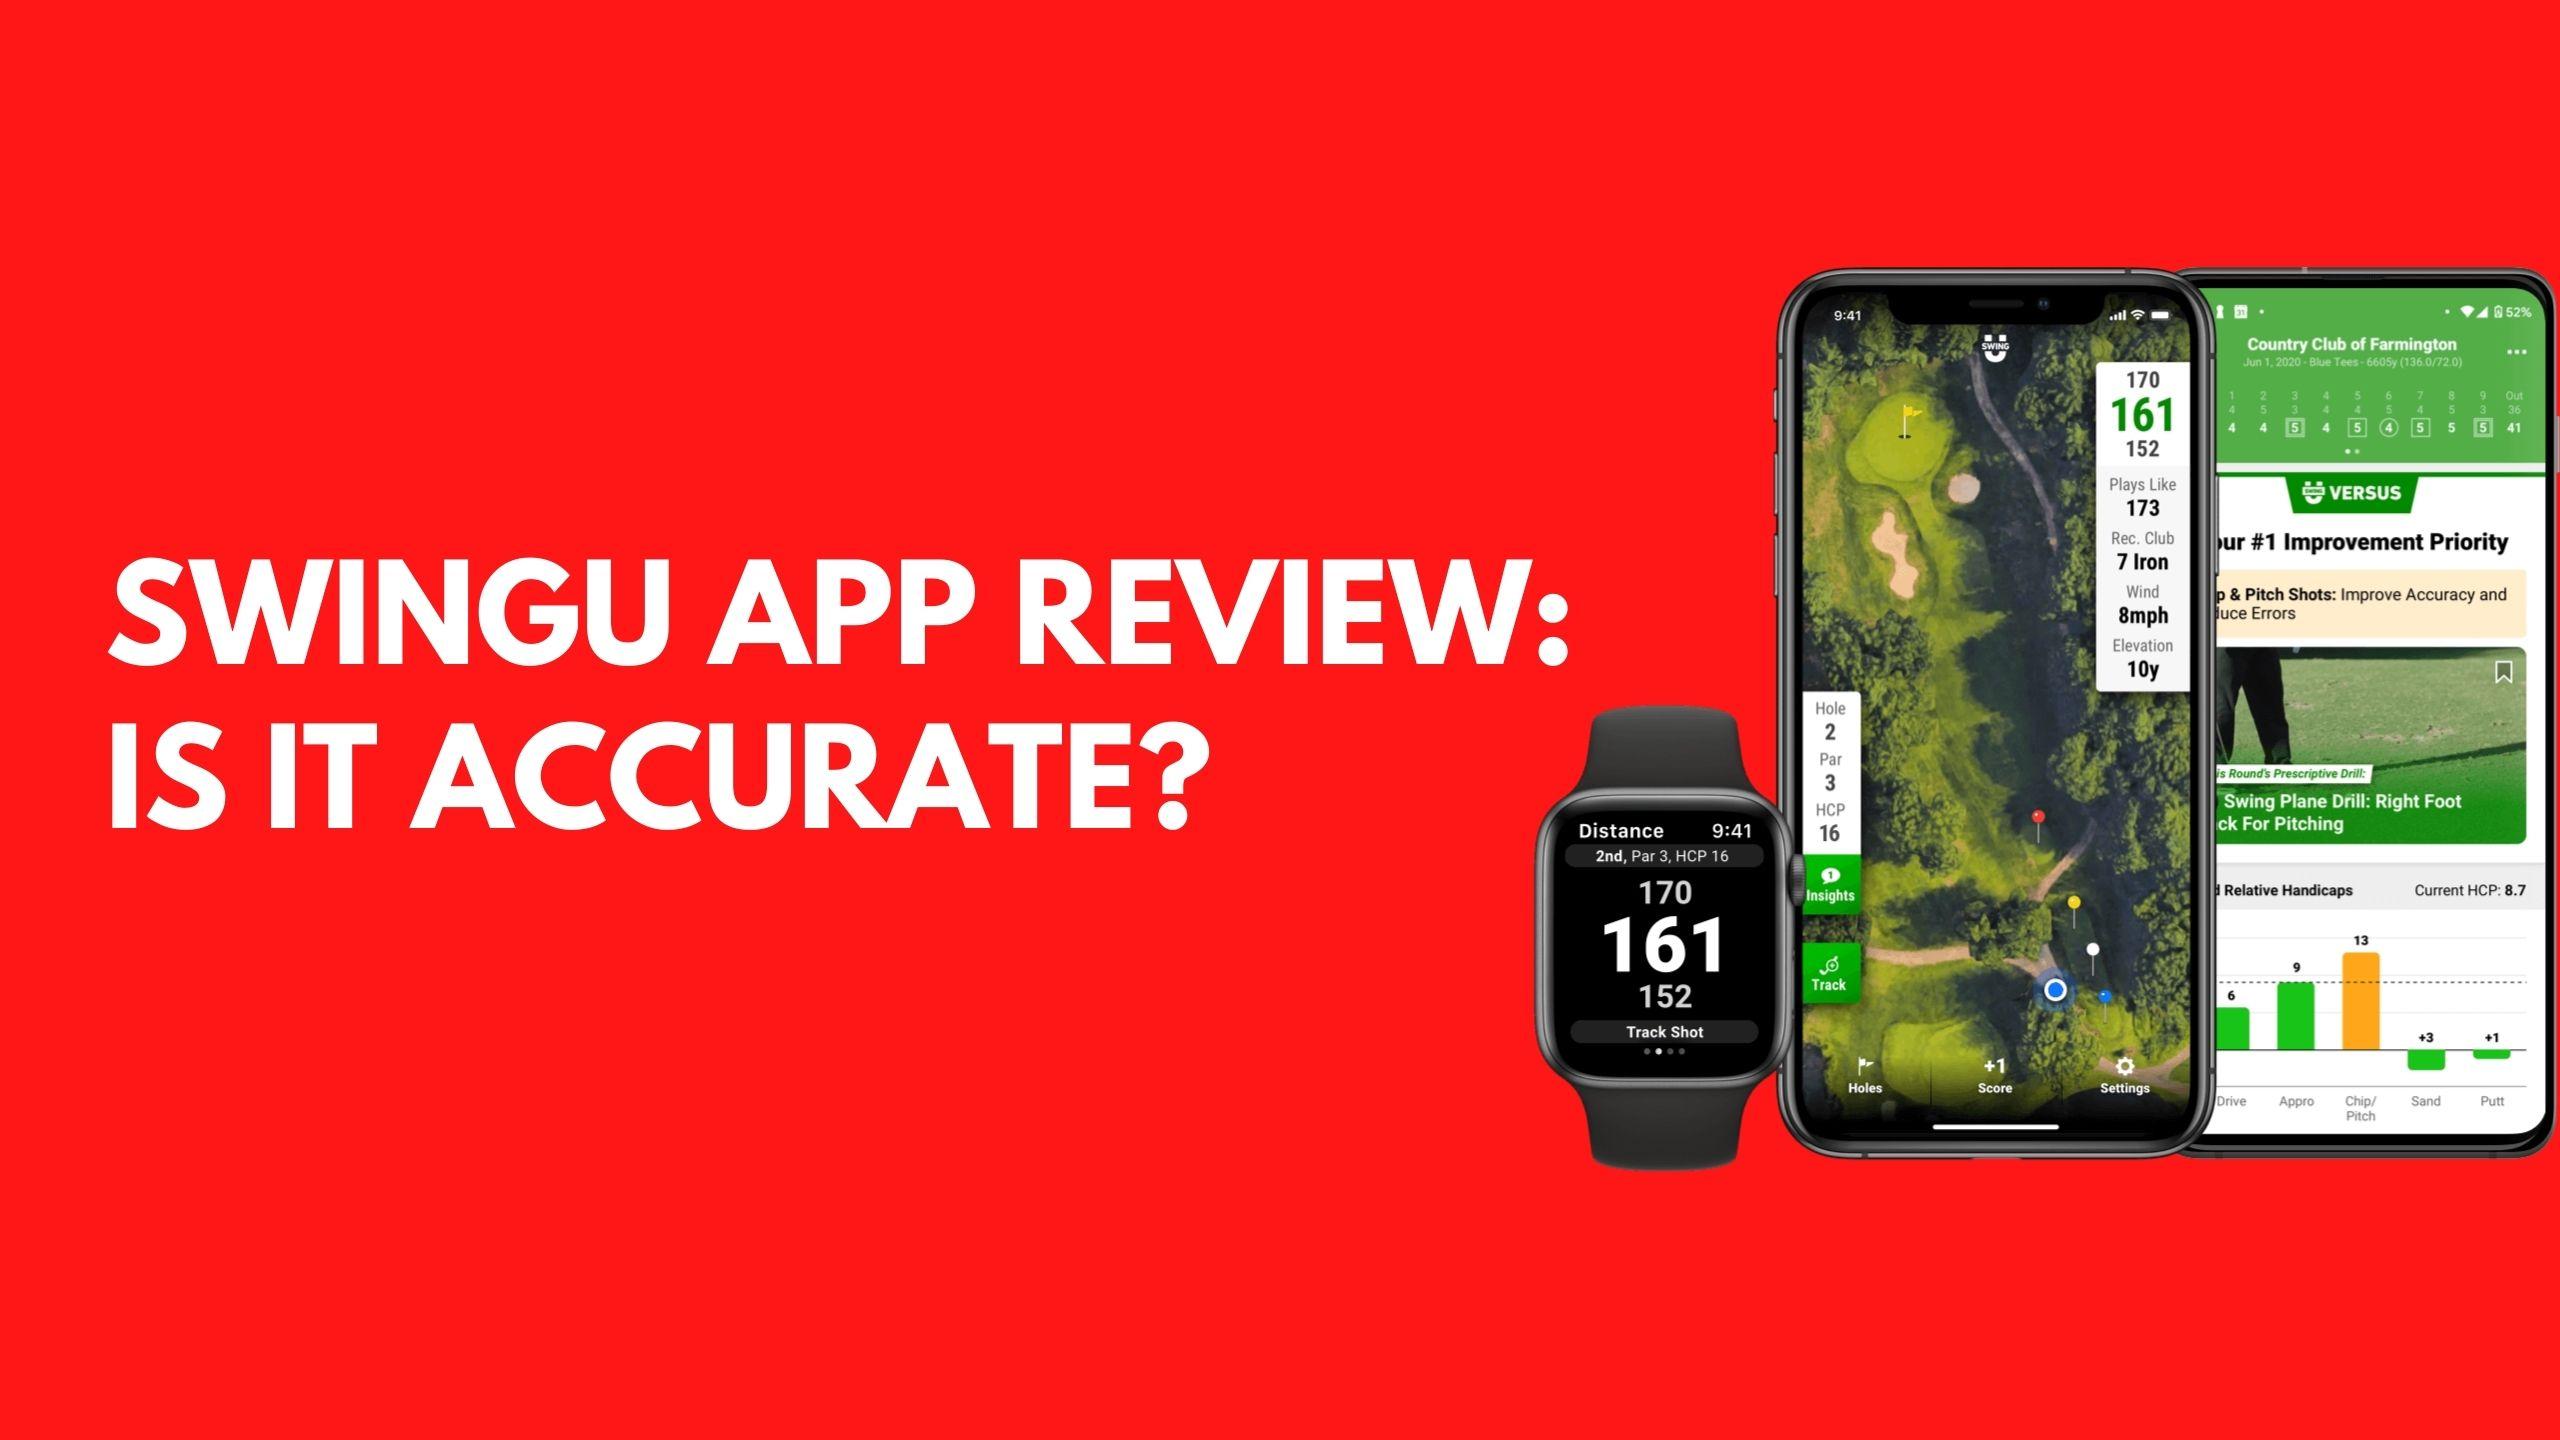 SwingU App Review